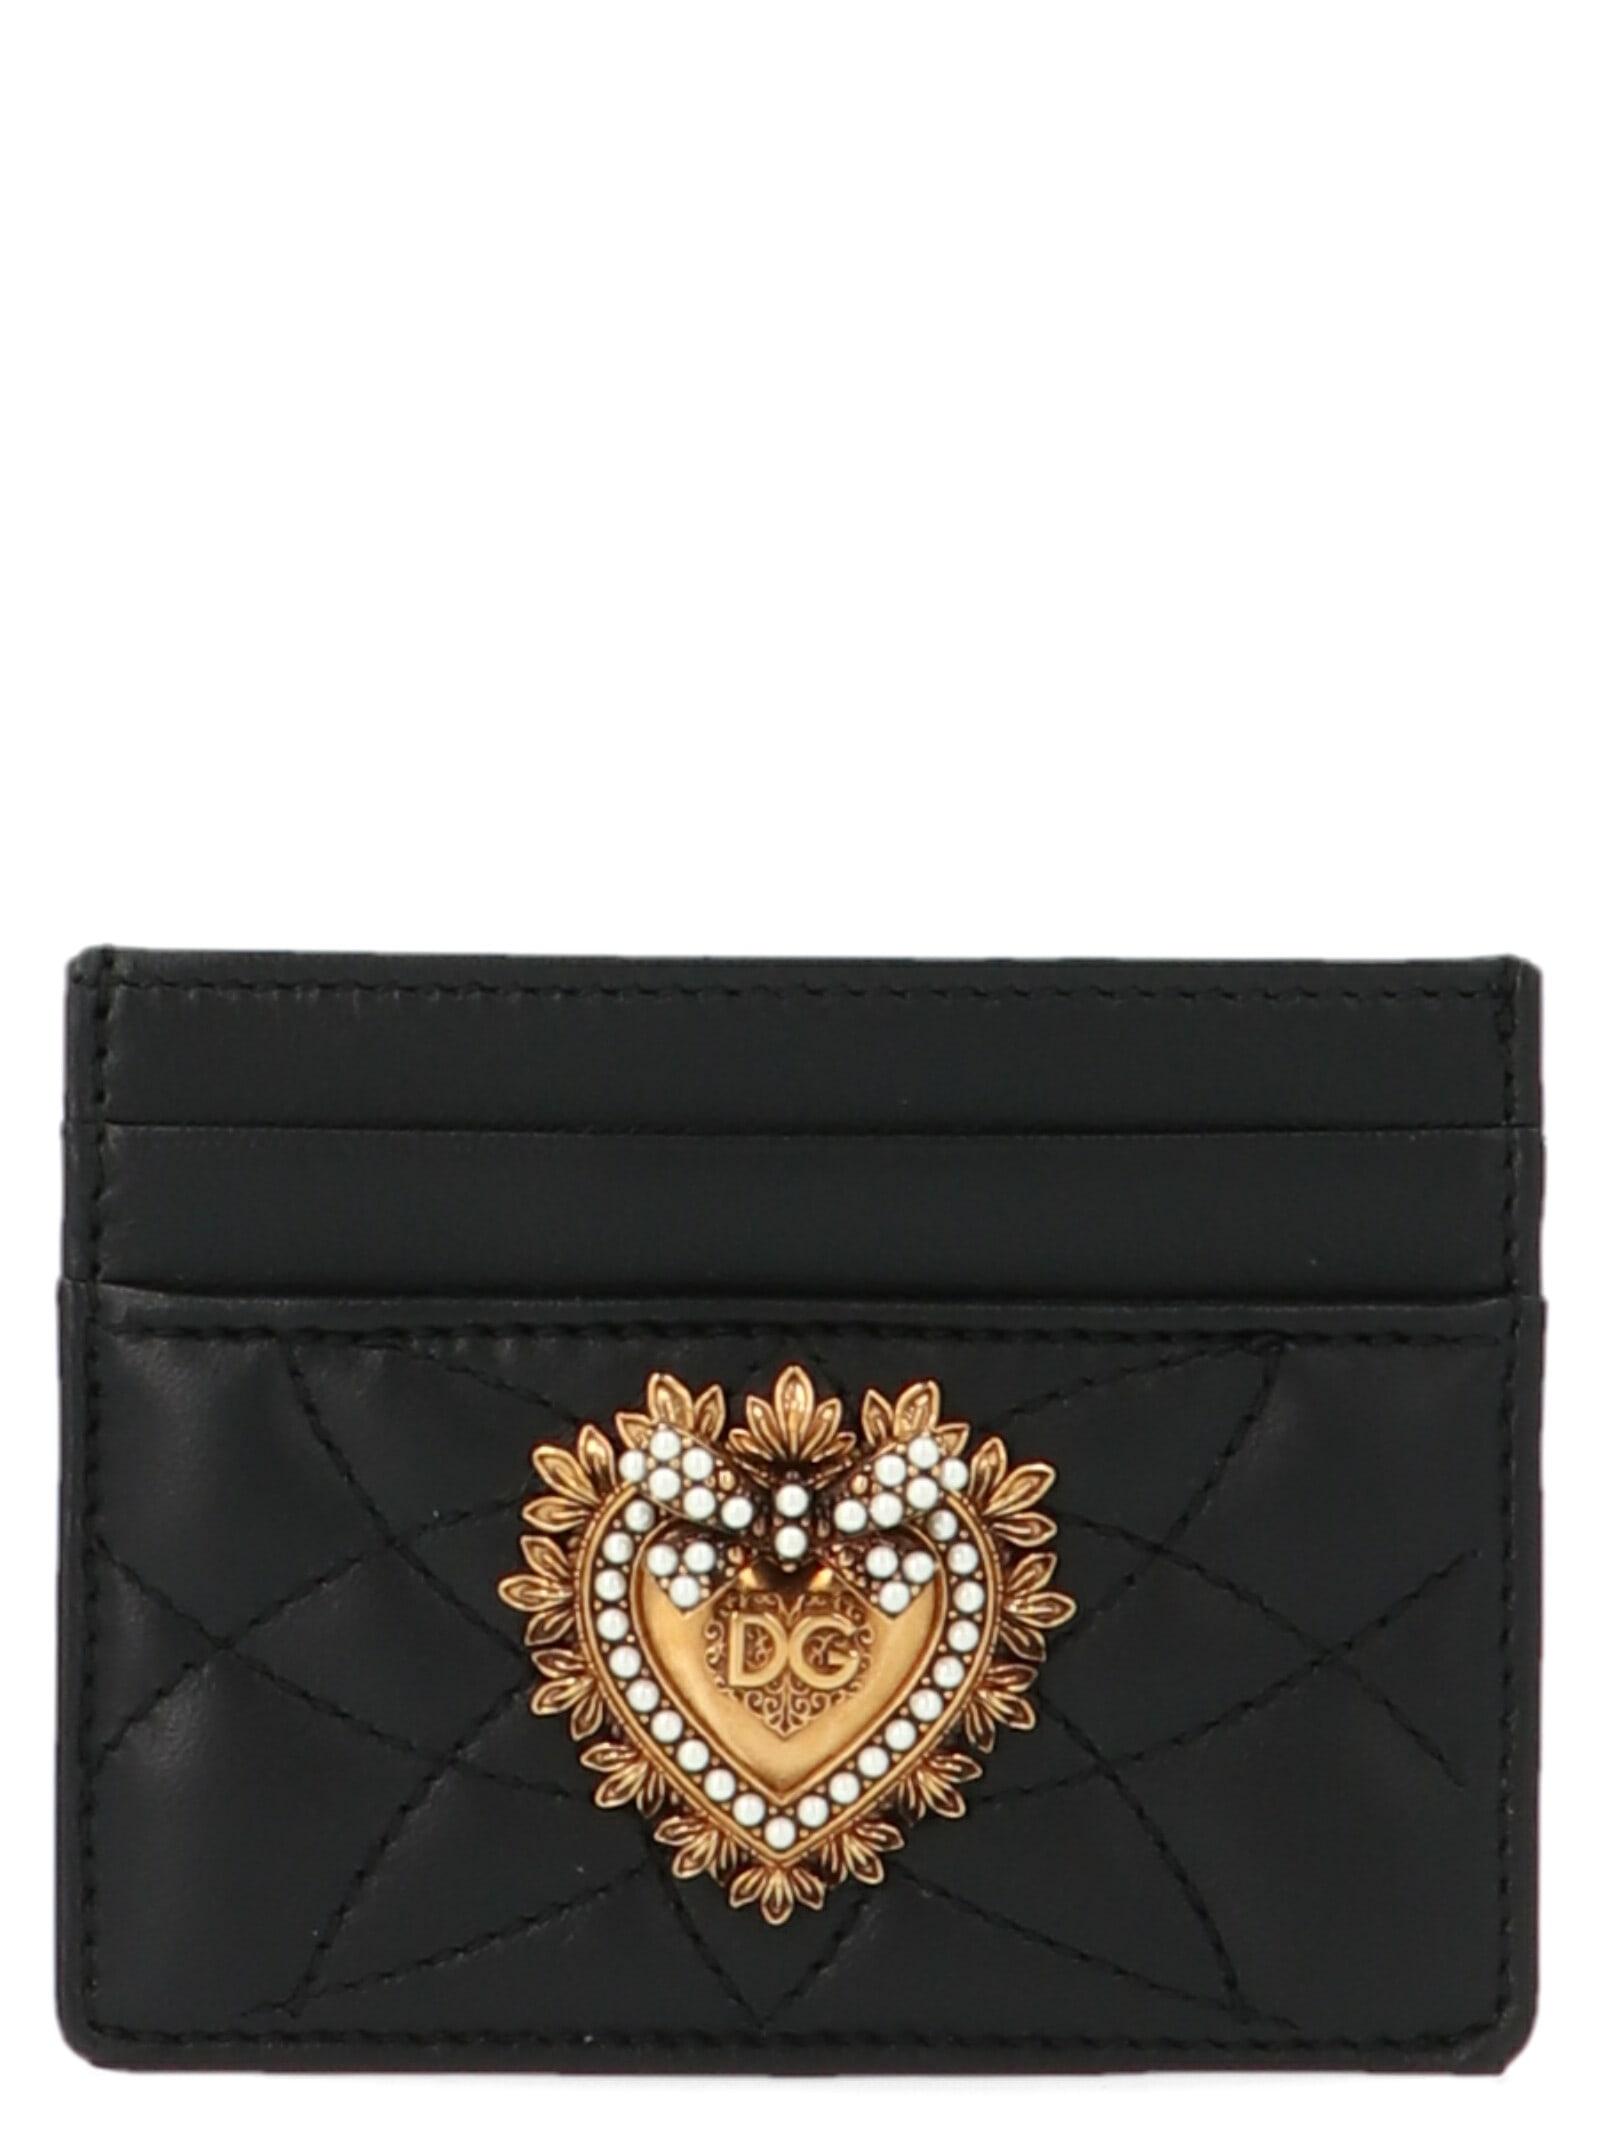 Dolce & Gabbana Cardholders DEVOTION CARDHOLDER